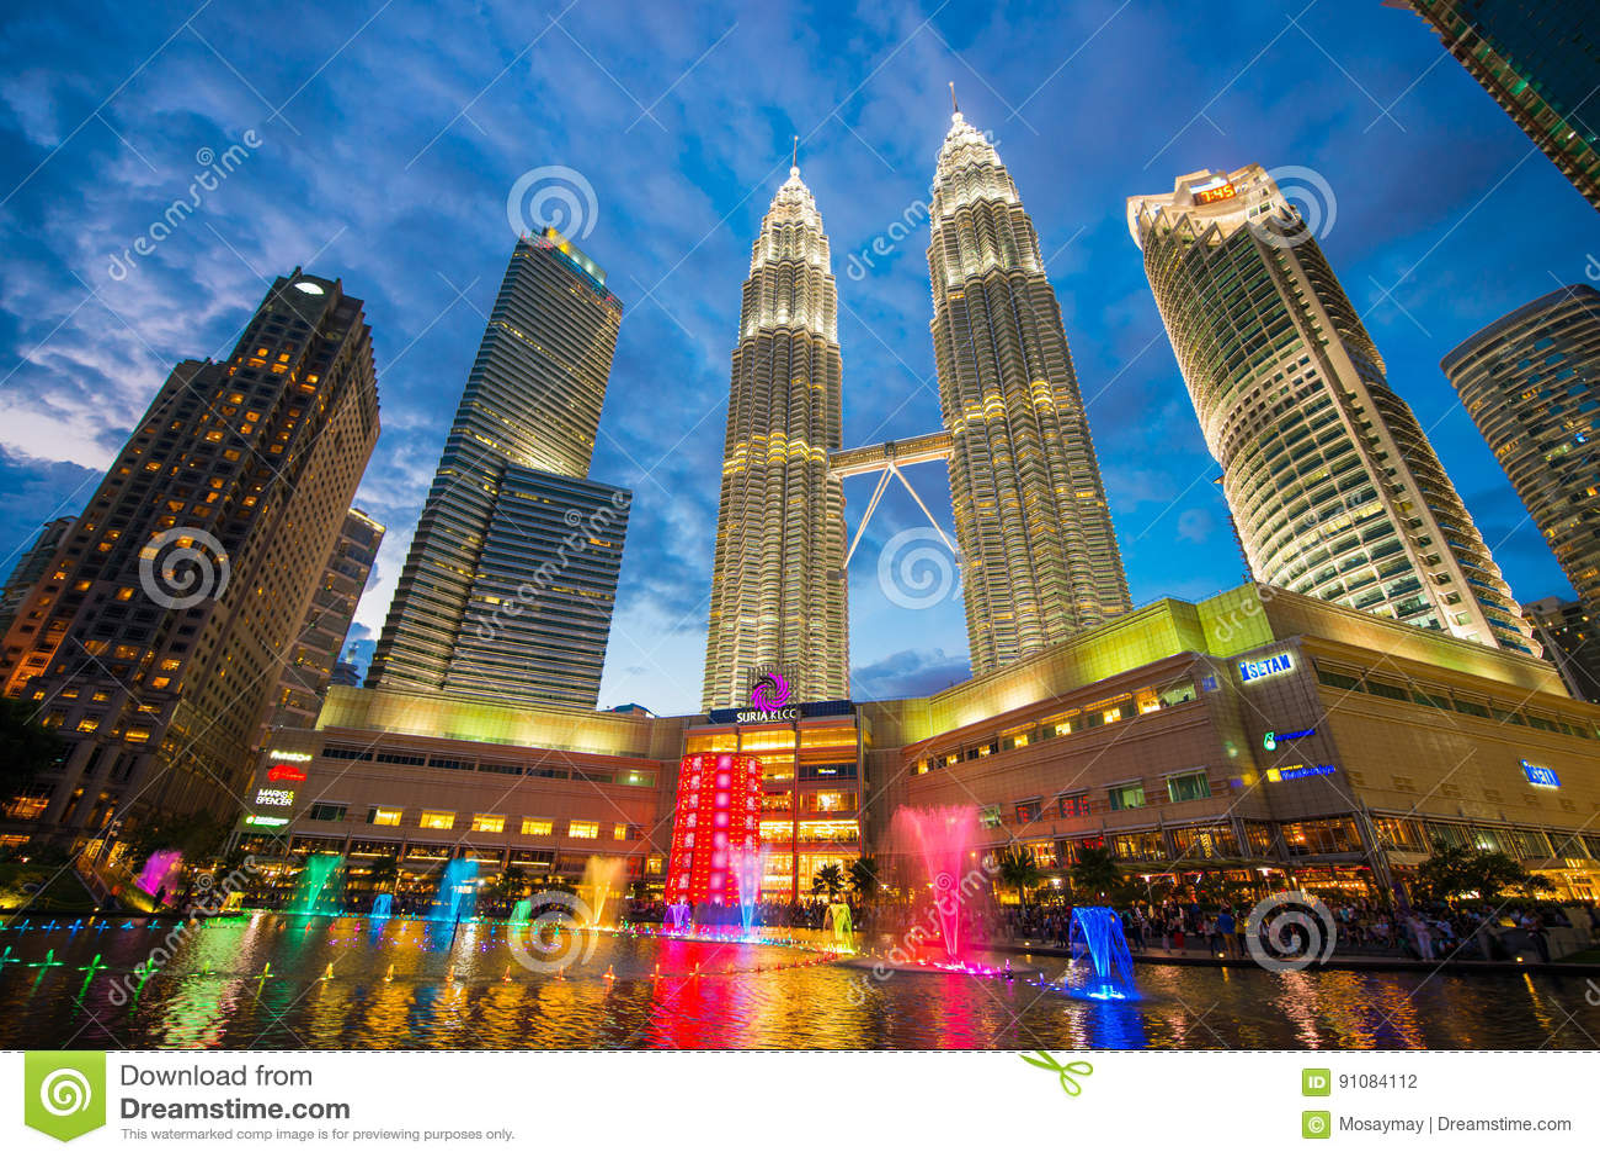 Malaysia 12 febuary 2017 petronas tower symbol of kuala lum malaysia 12 febuary 2017 petronas tower symbol of kuala lum amazing tourist editorial stock photo buycottarizona Gallery